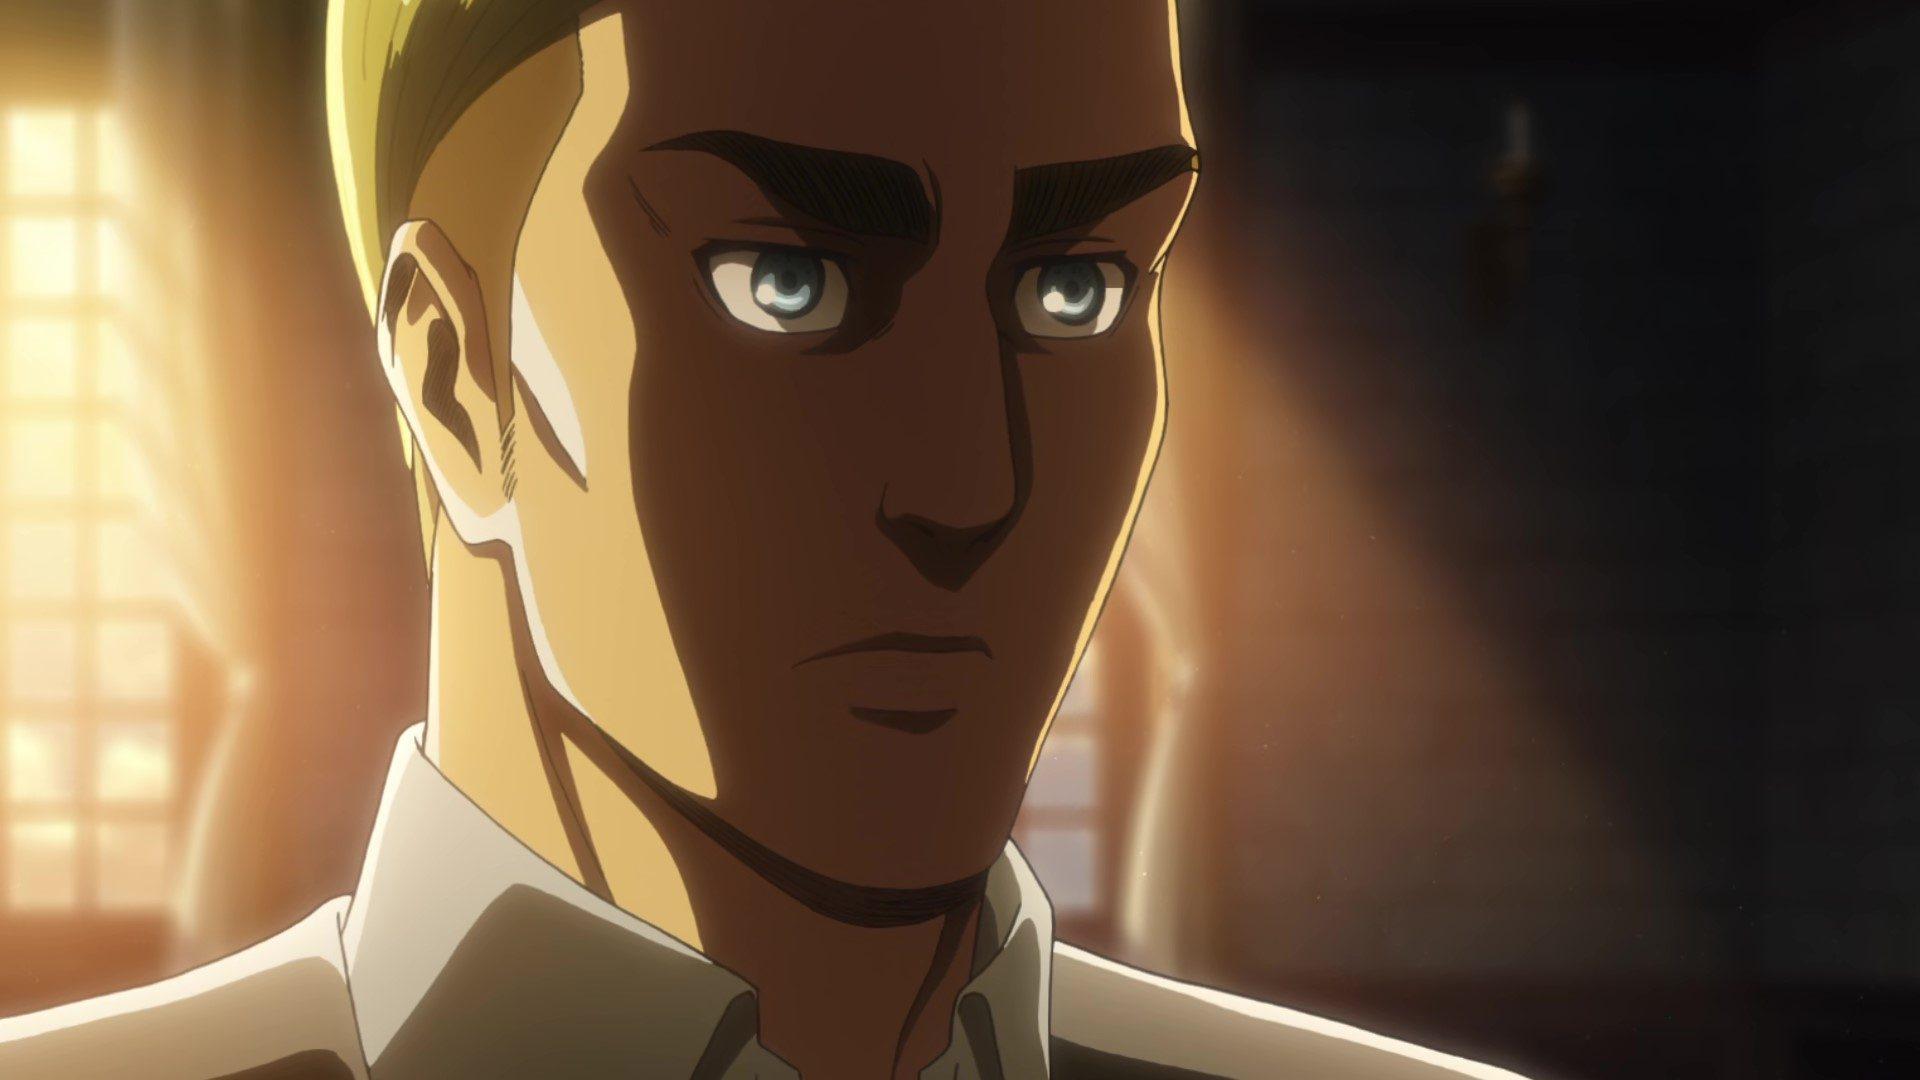 Attack on Titan Season 3 Episode 12 English Dubbed - AnimeGT